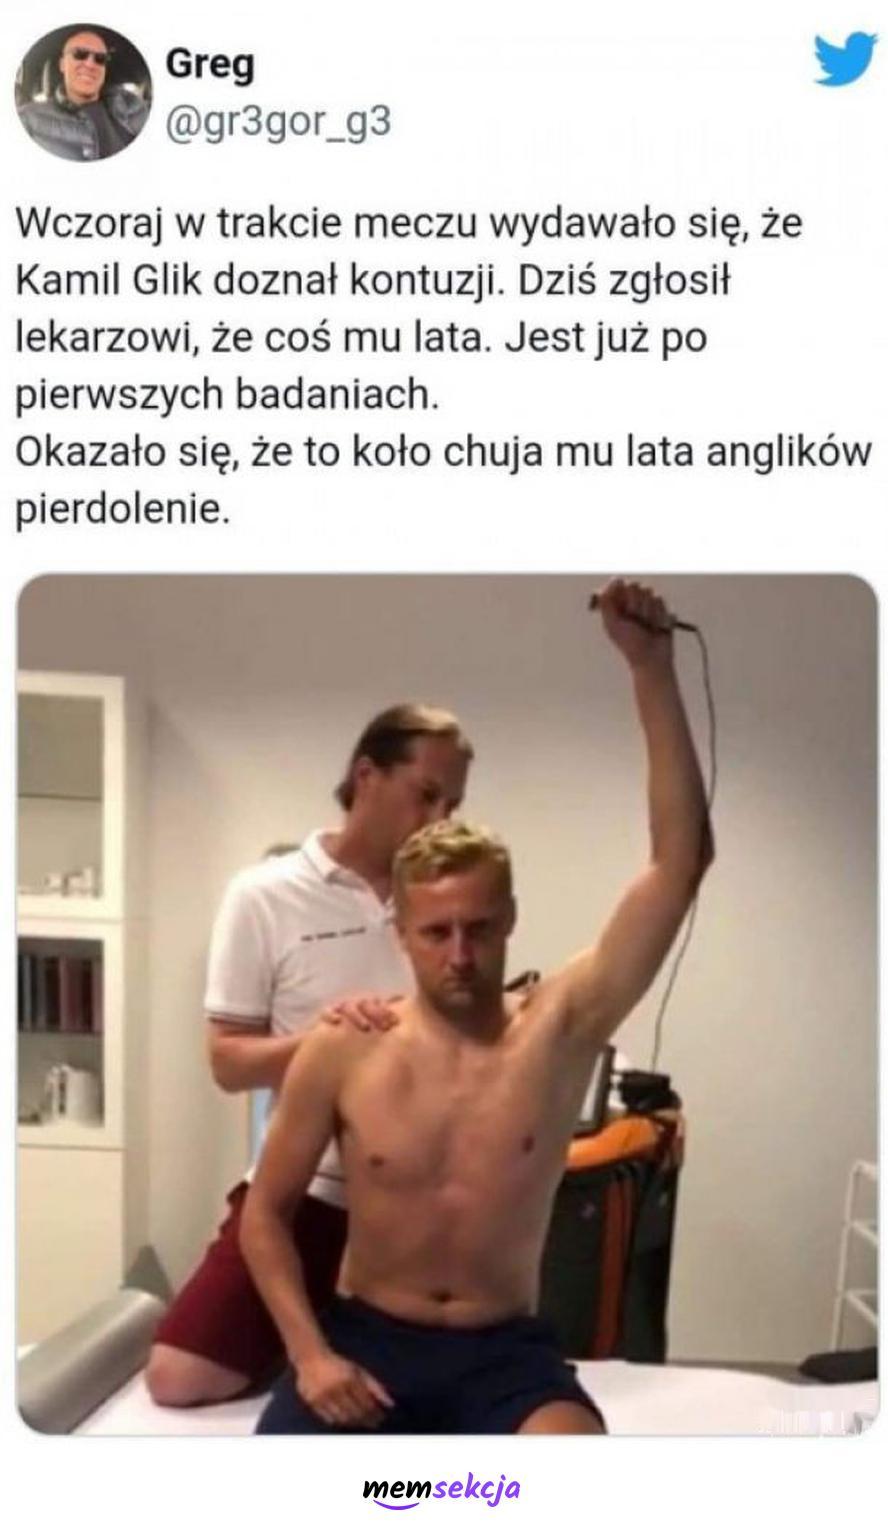 Co lata Glikowi?. Sport. Kamil  Glik